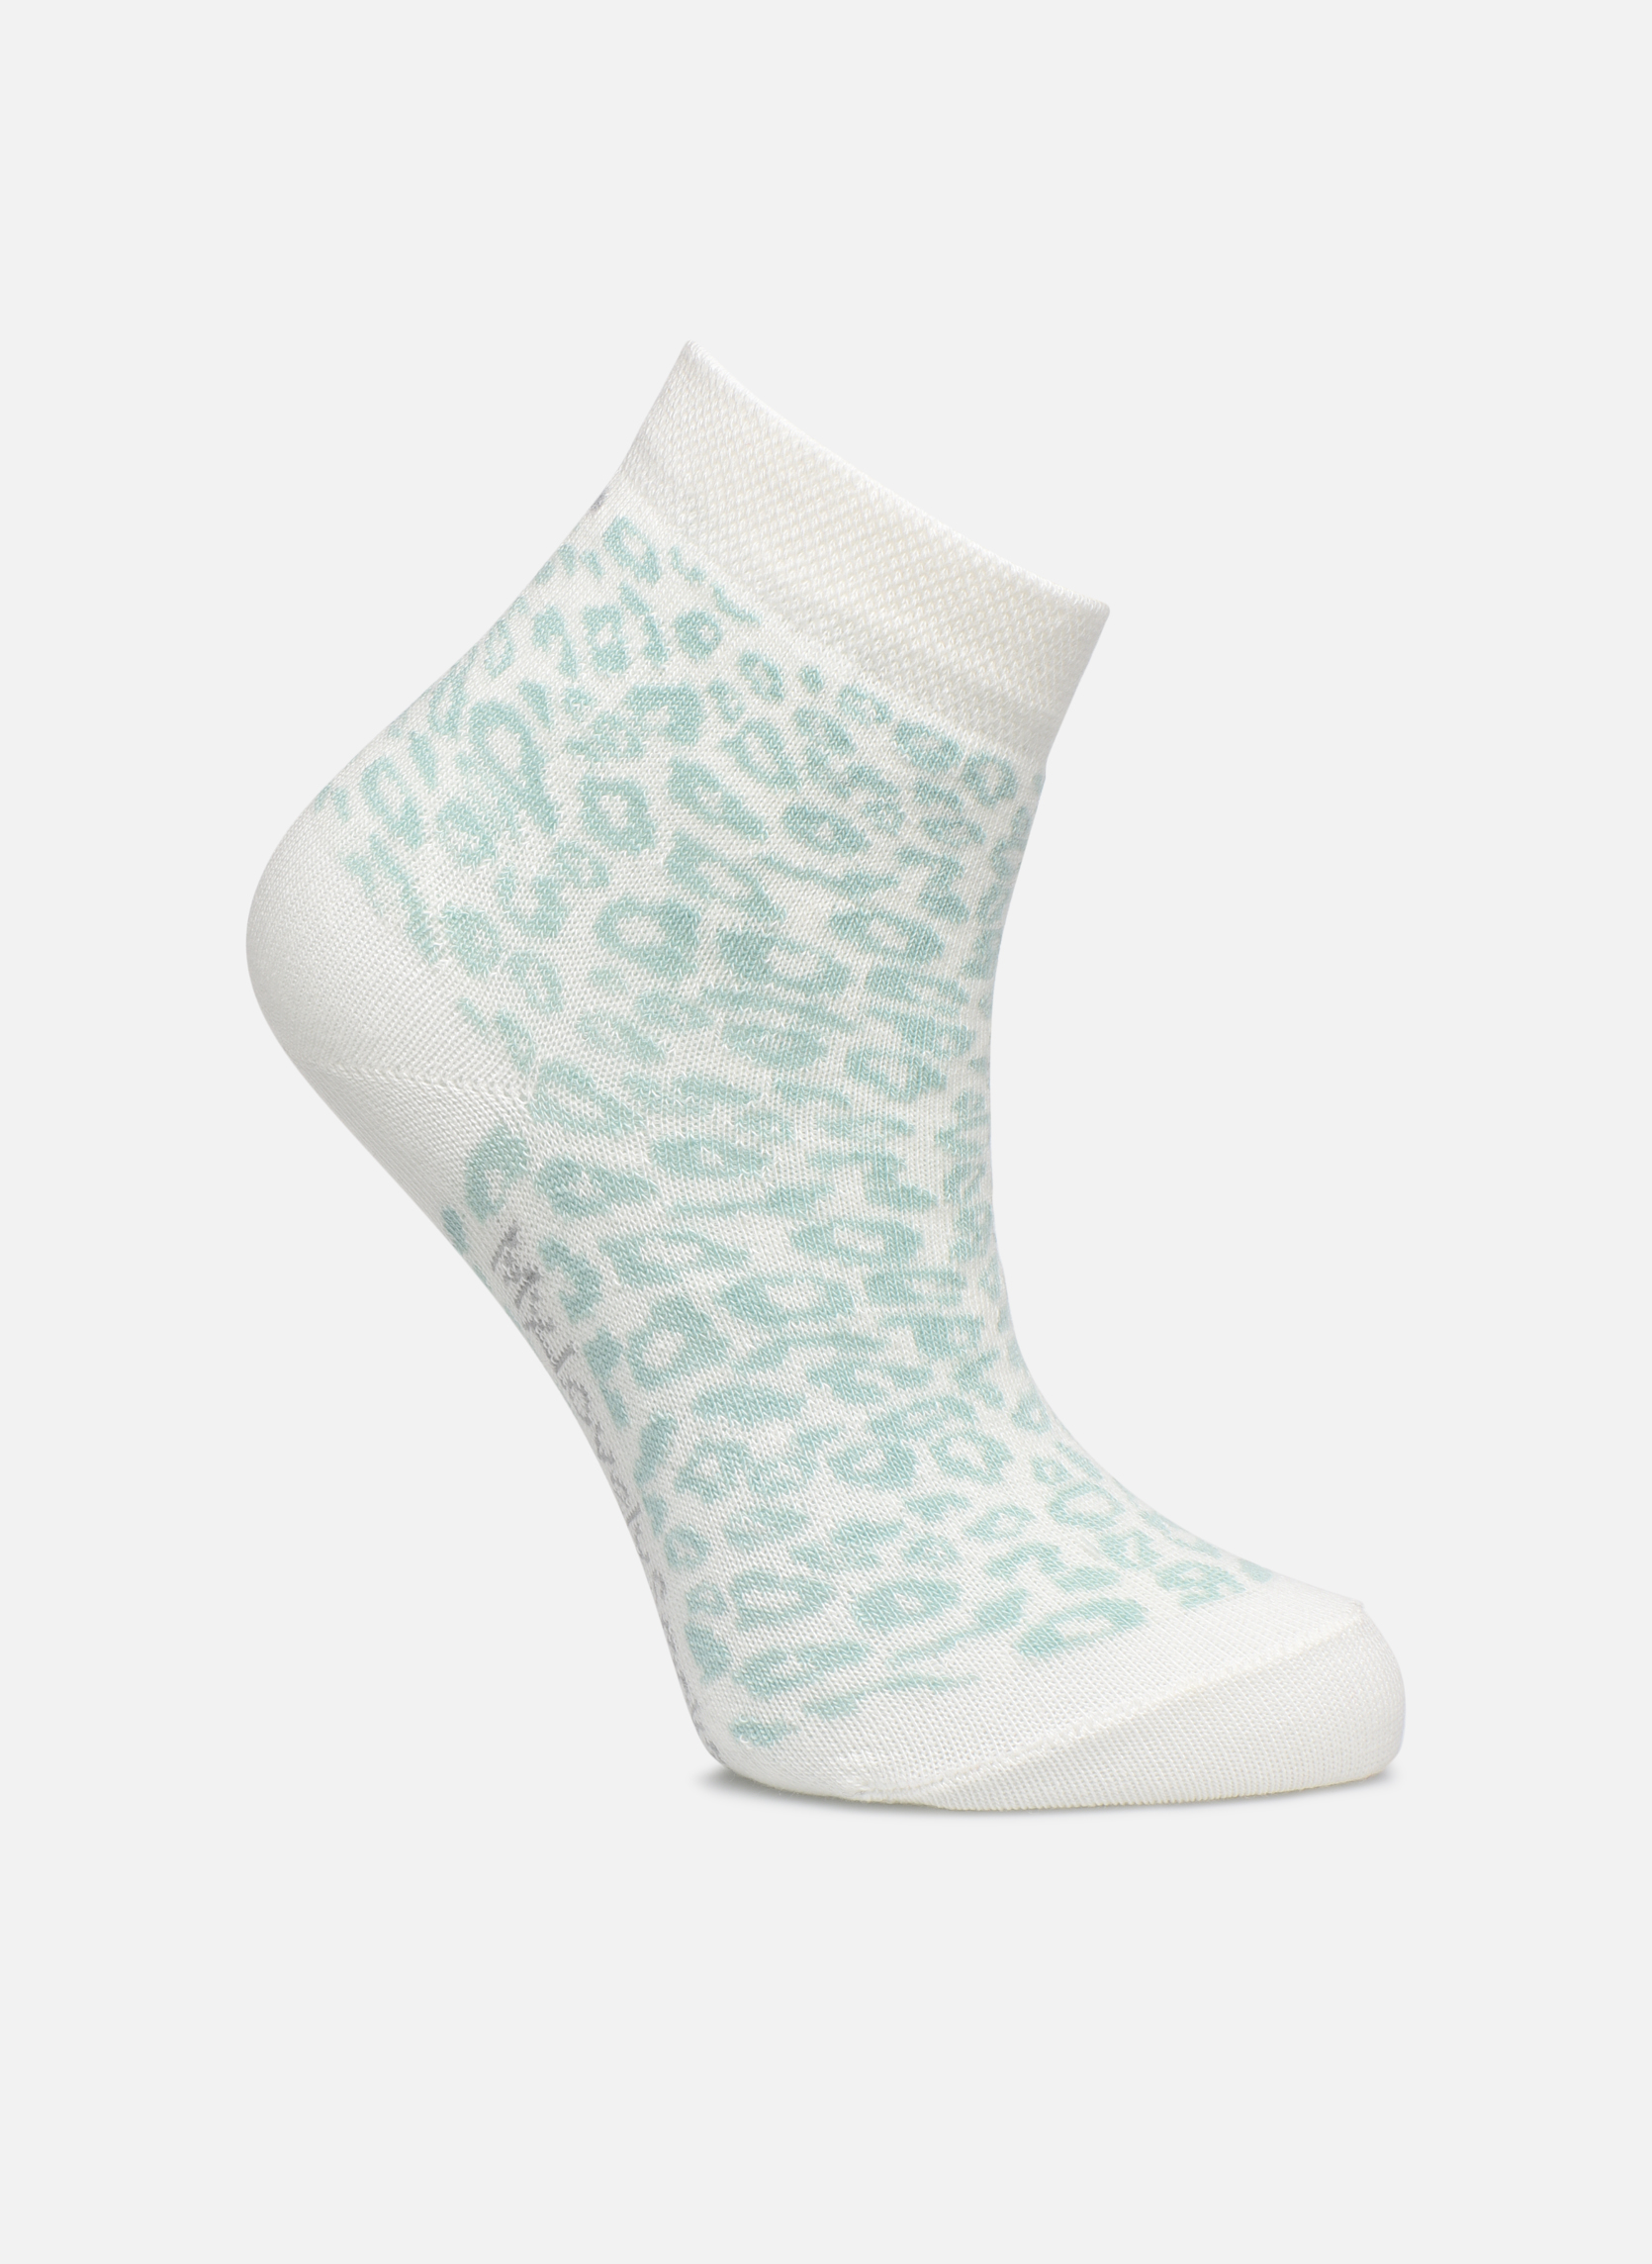 leopard blanc vert d'eau